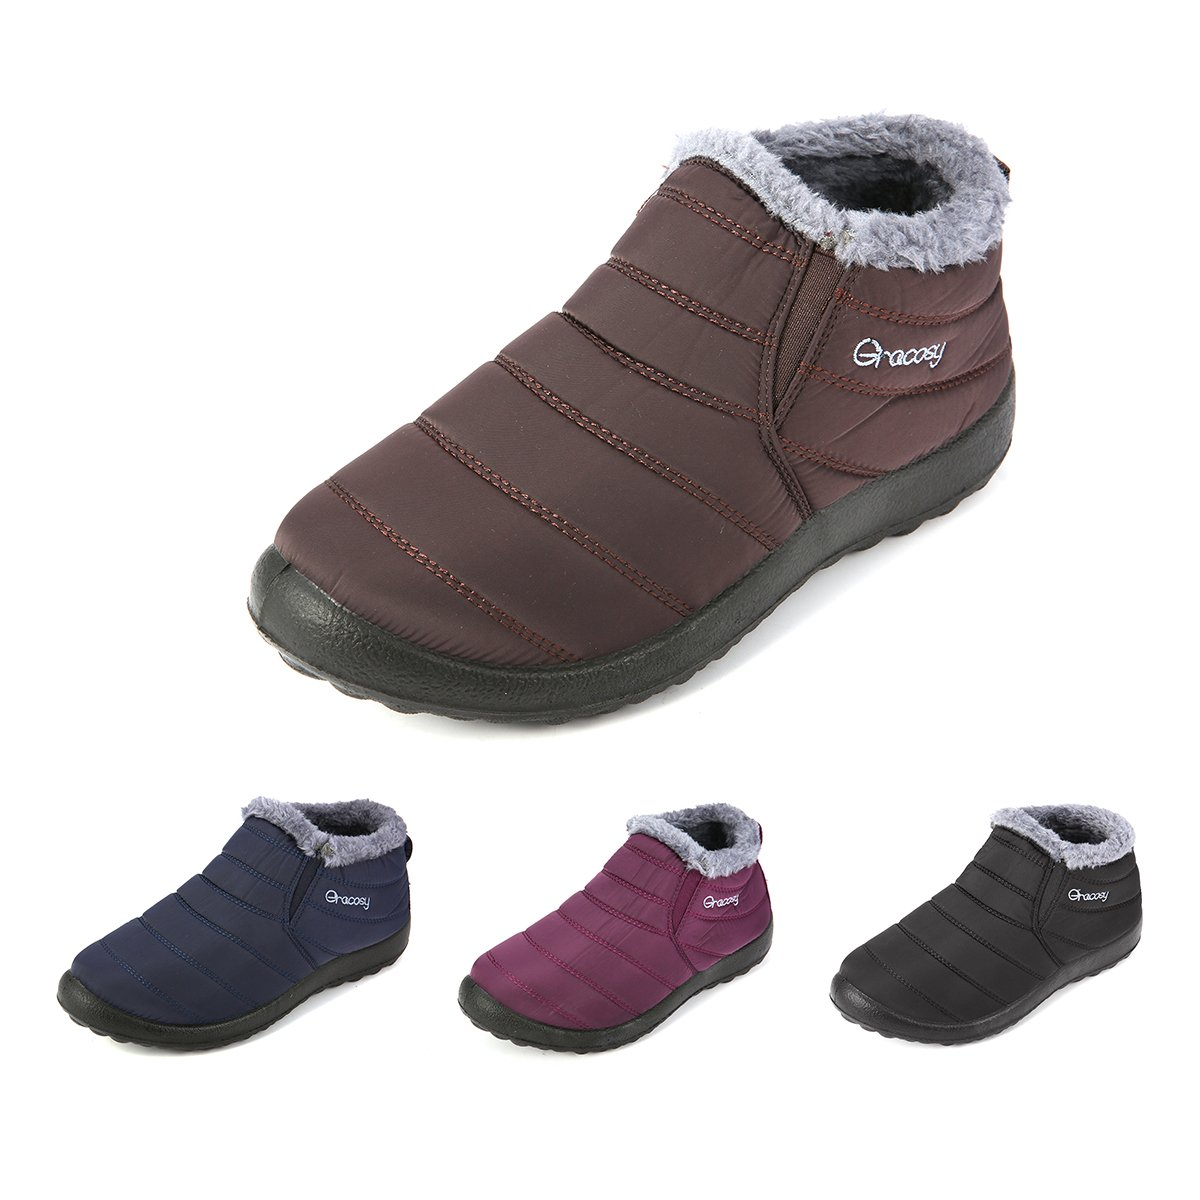 841da793190a5b Amazon.com  gracosy Warm Snow Boots